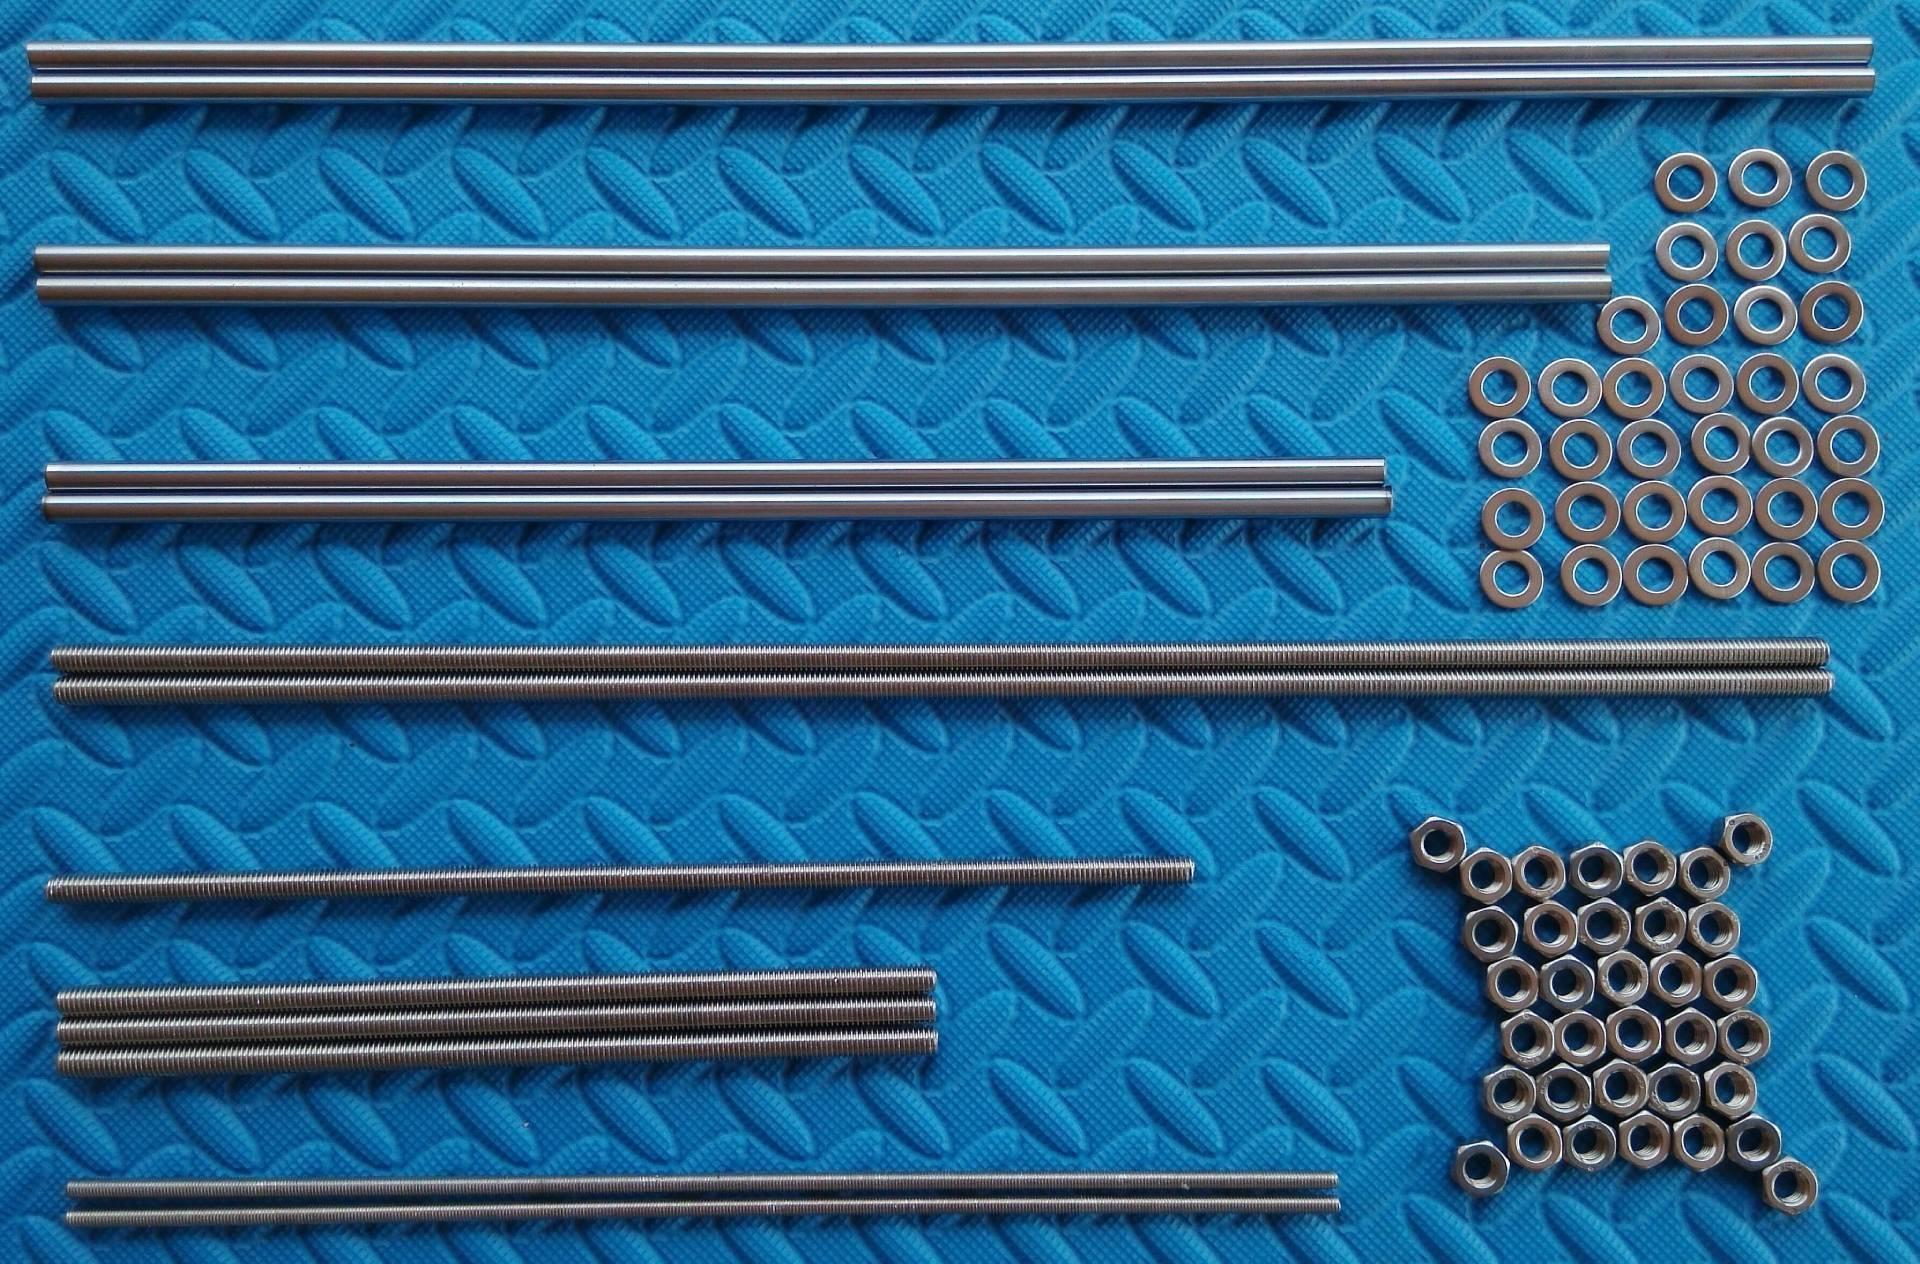 Sintron] Ultimate 3D Printer Full Complete Kit for DIY Reprap Prusa ...